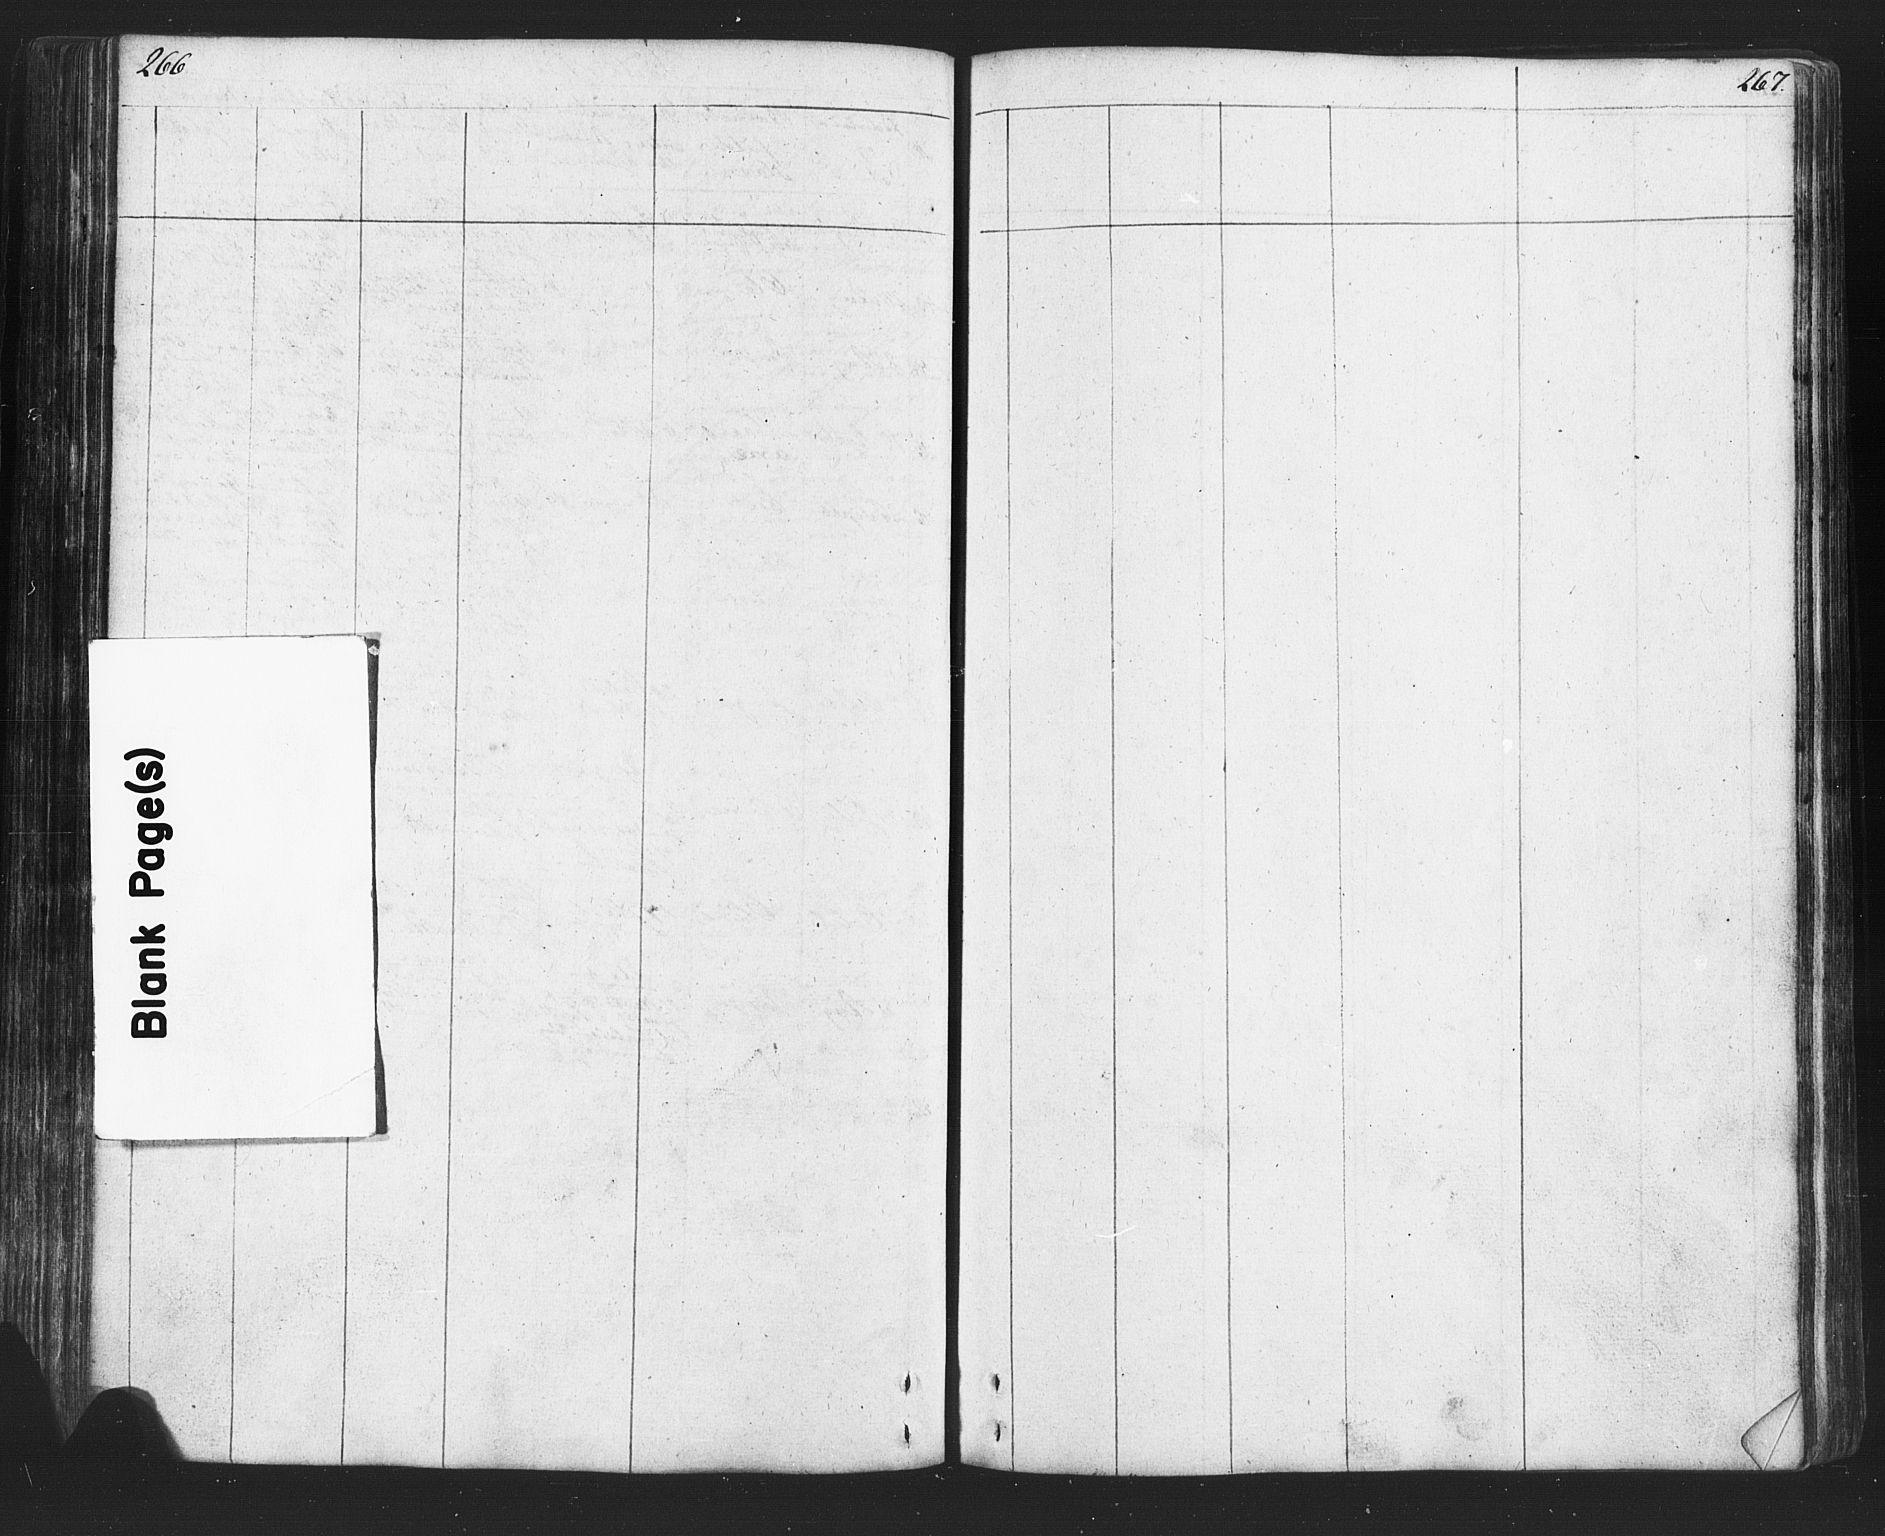 SAH, Lesja prestekontor, Klokkerbok nr. 2, 1832-1850, s. 266-267